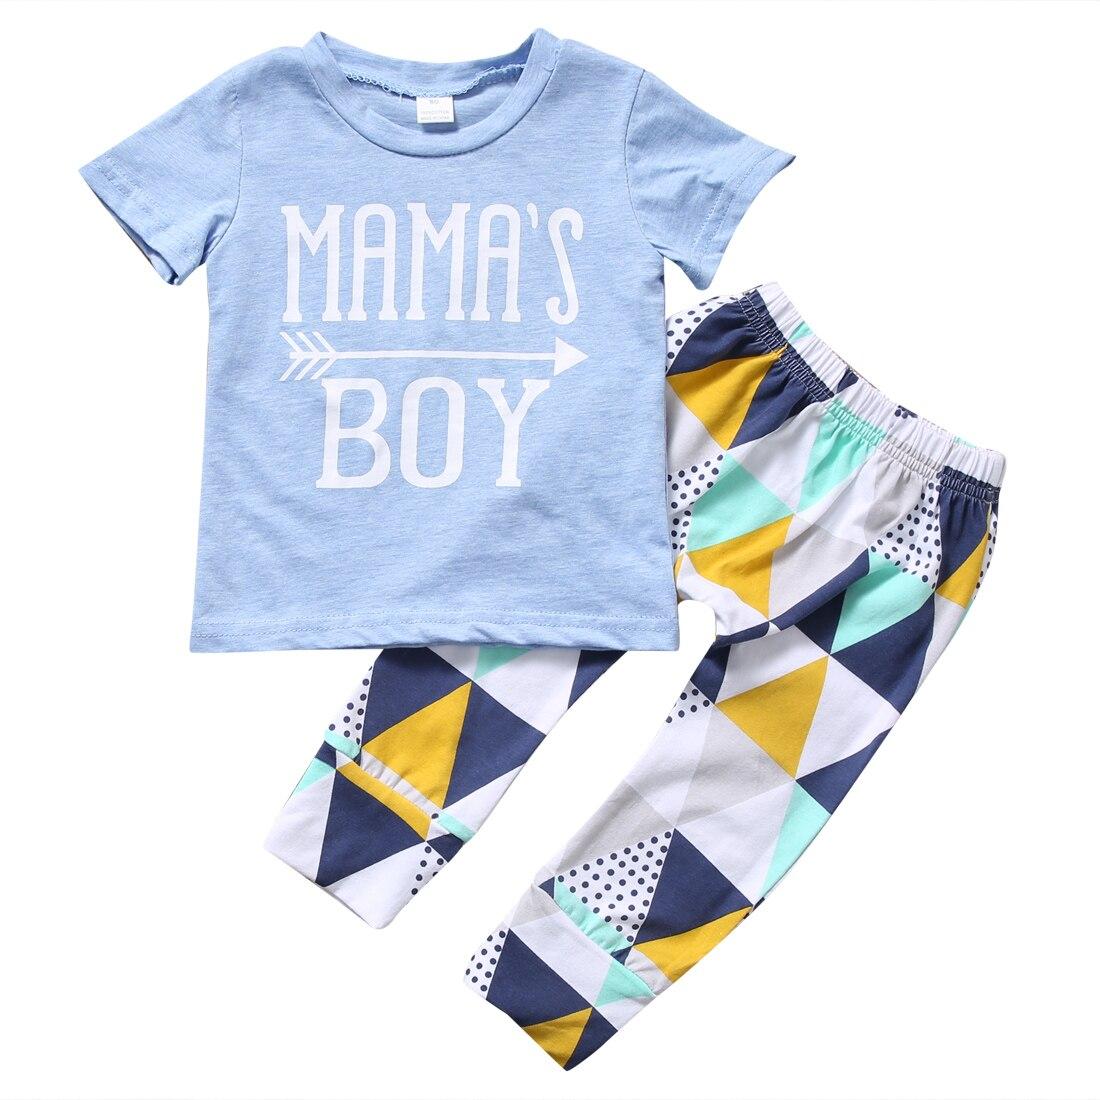 2Pcs Set Newborn Infant Kids Baby Boy Summer Clothes T-shirt Tops+Pants Outfits Set Baby Clothing <br><br>Aliexpress